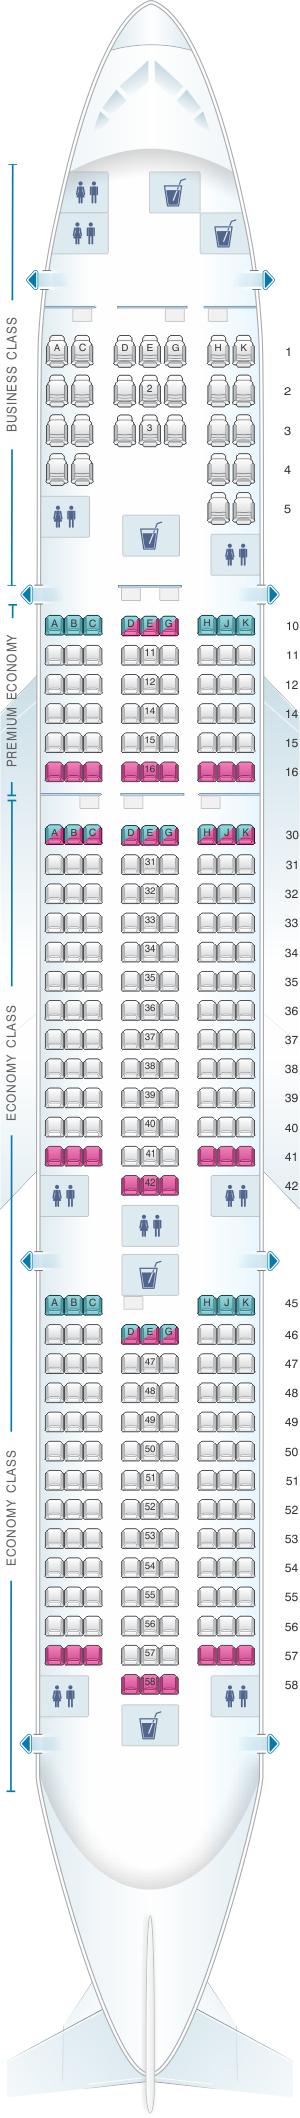 Seat map for Vietnam Airlines Boeing B777 200ER V2